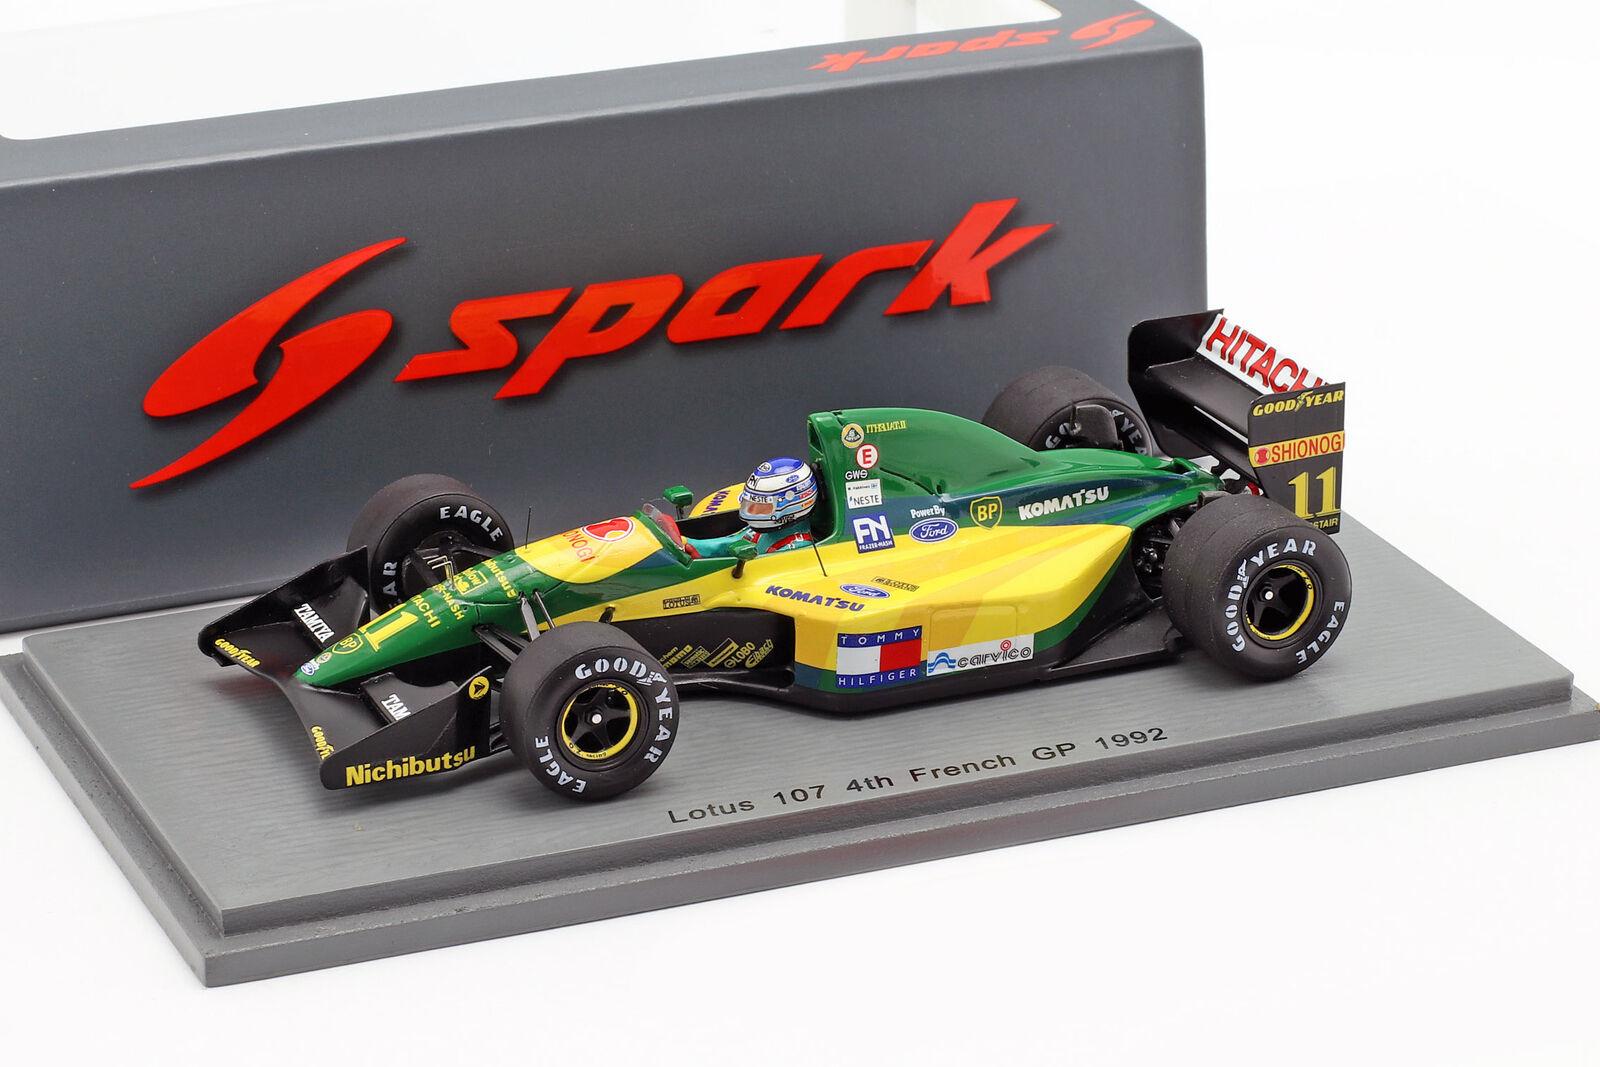 Mika Häkkinen Lotus 107 #11 4th FRANCIA GP Formula 1 1992 1:43 SPARK